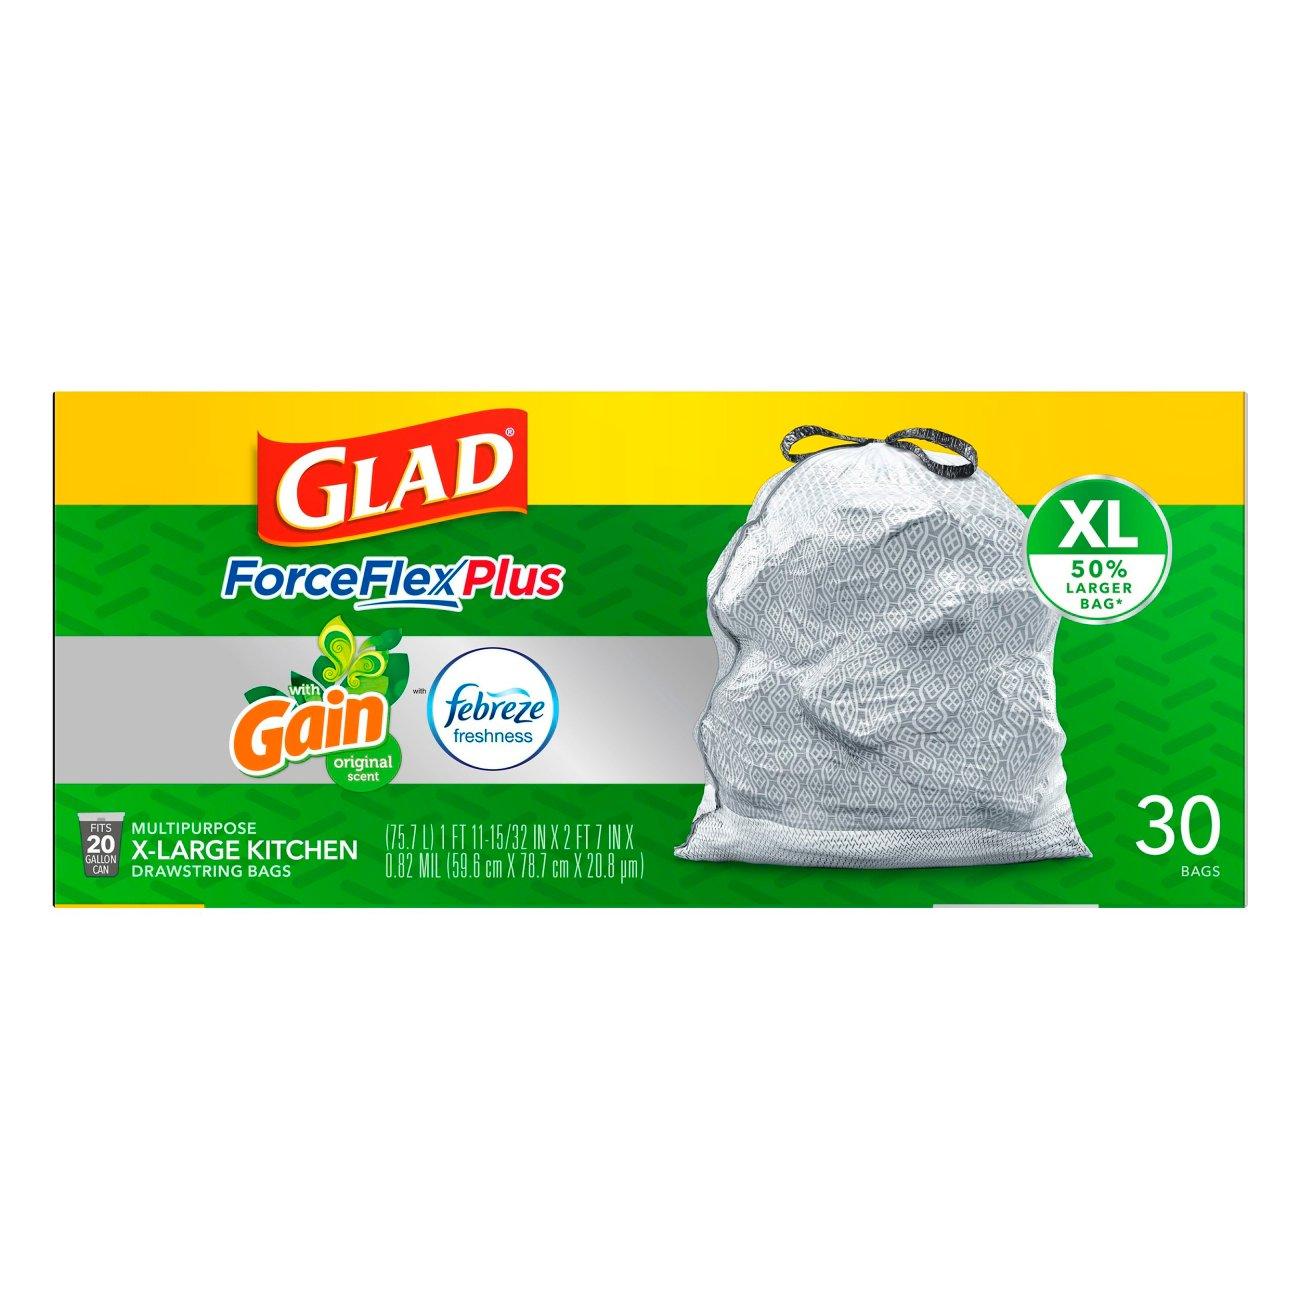 Glad X Large Kitchen Drawstring Trash Bags ForceFlex Kitchen Pro 20 Gallon